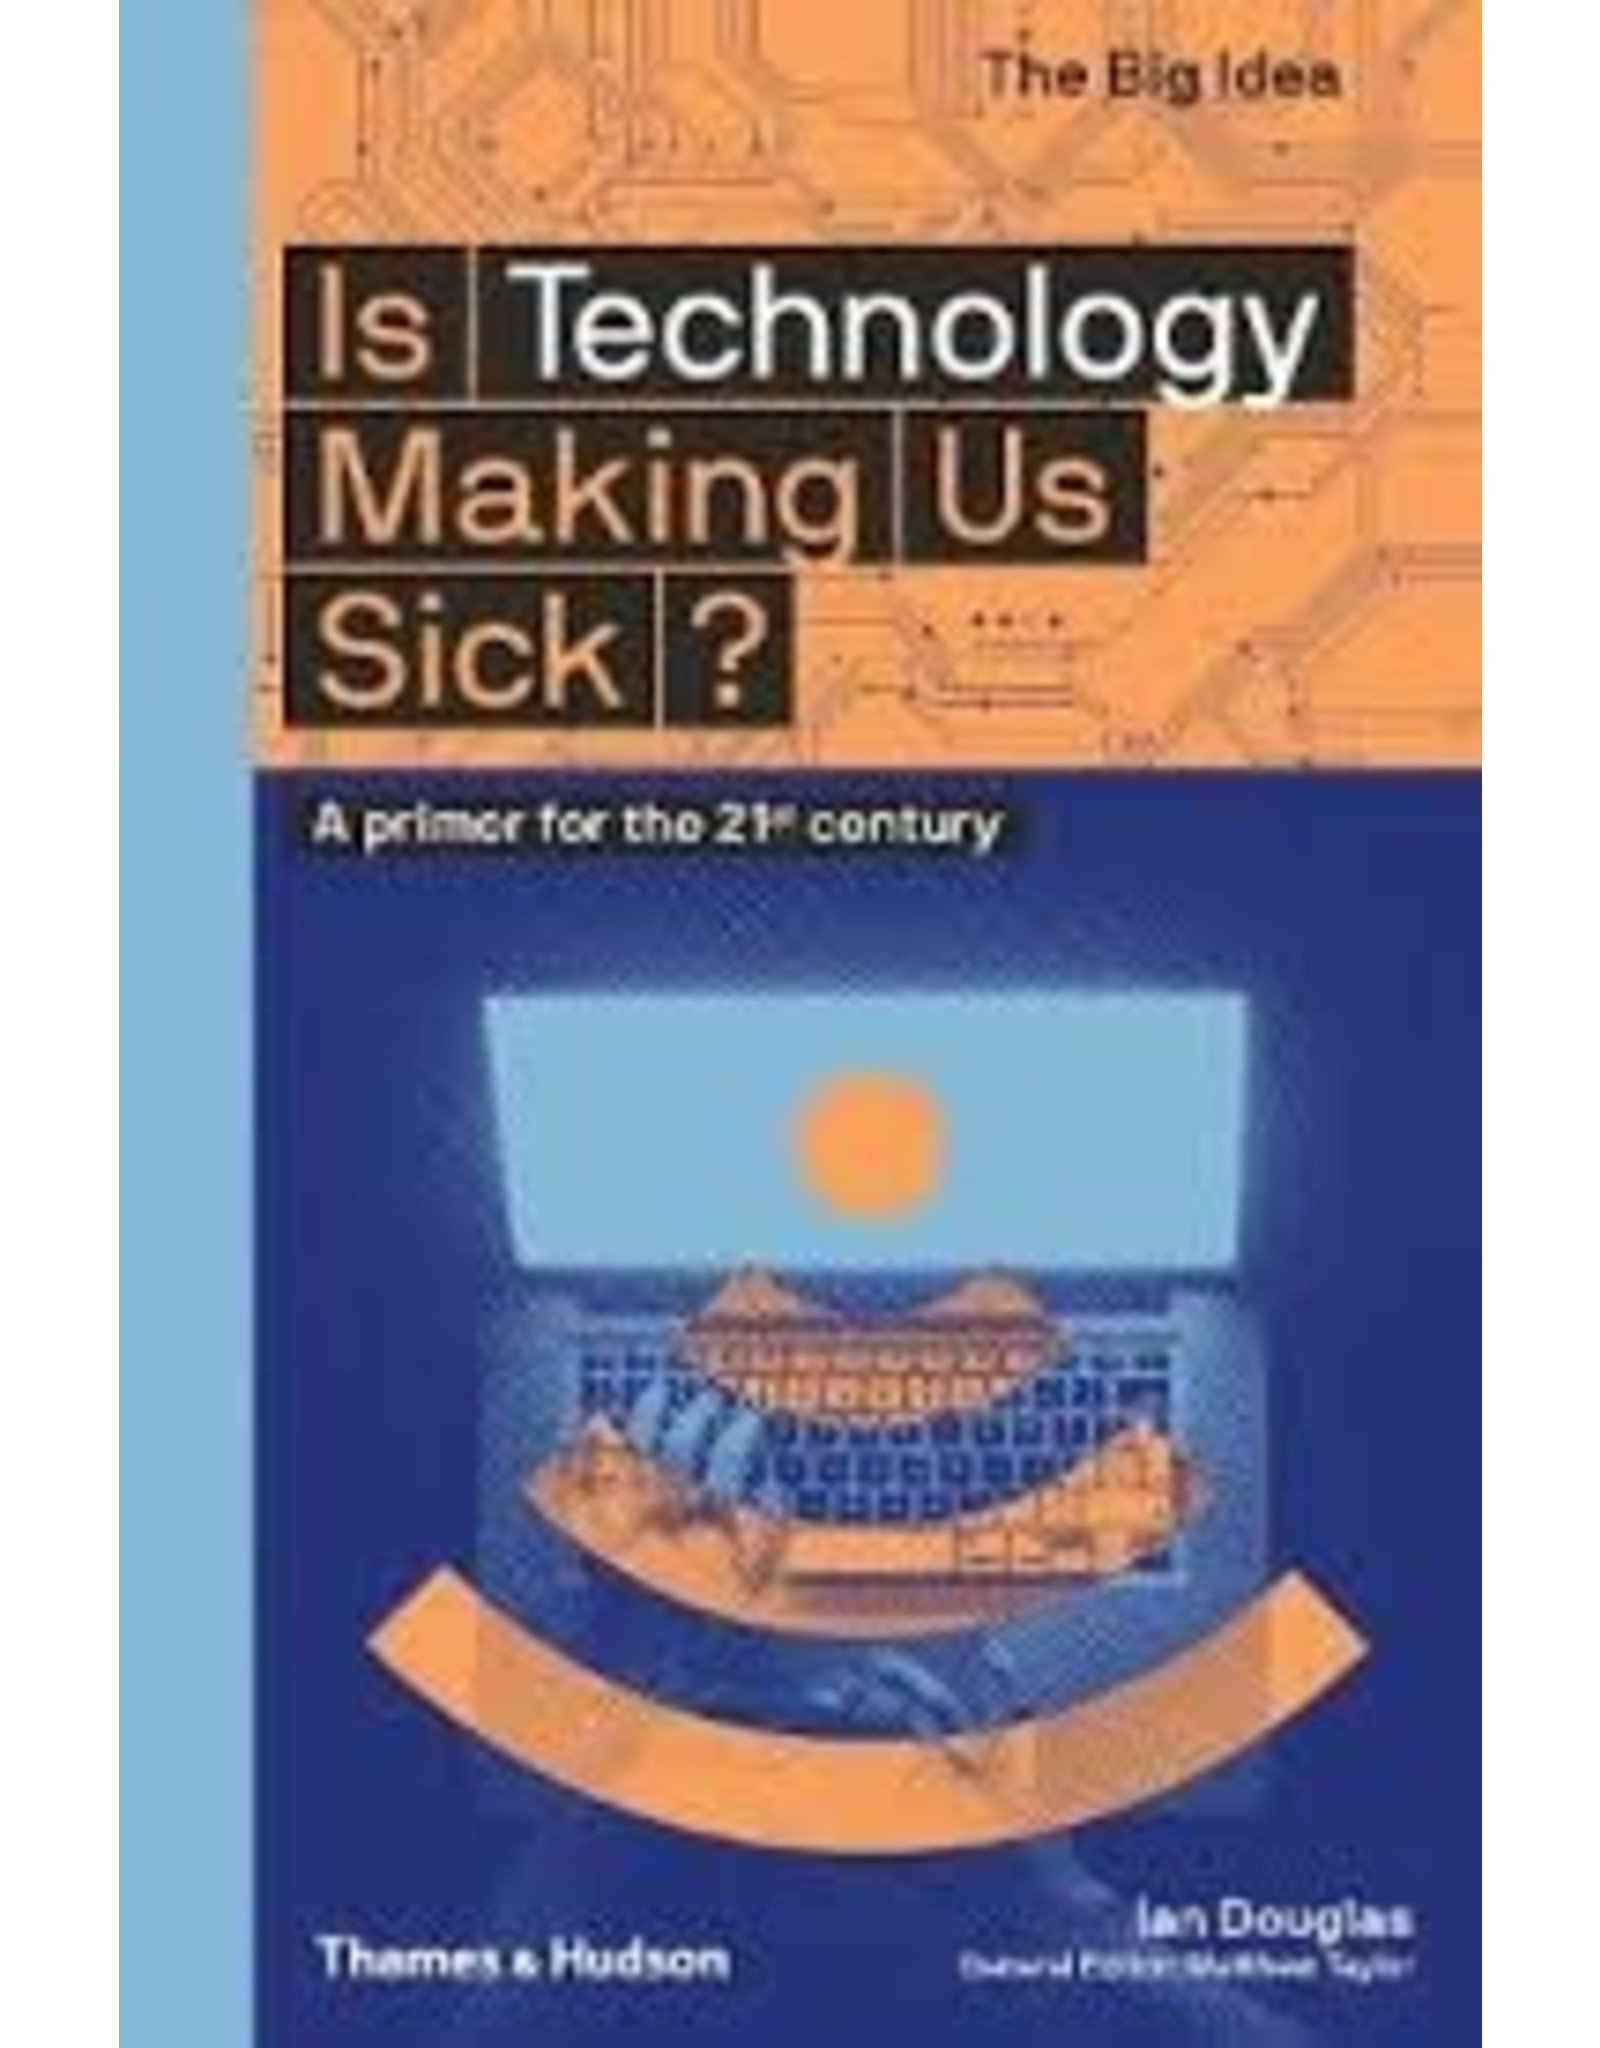 Books Is Technology Making Us Sick? by Ian Douglas